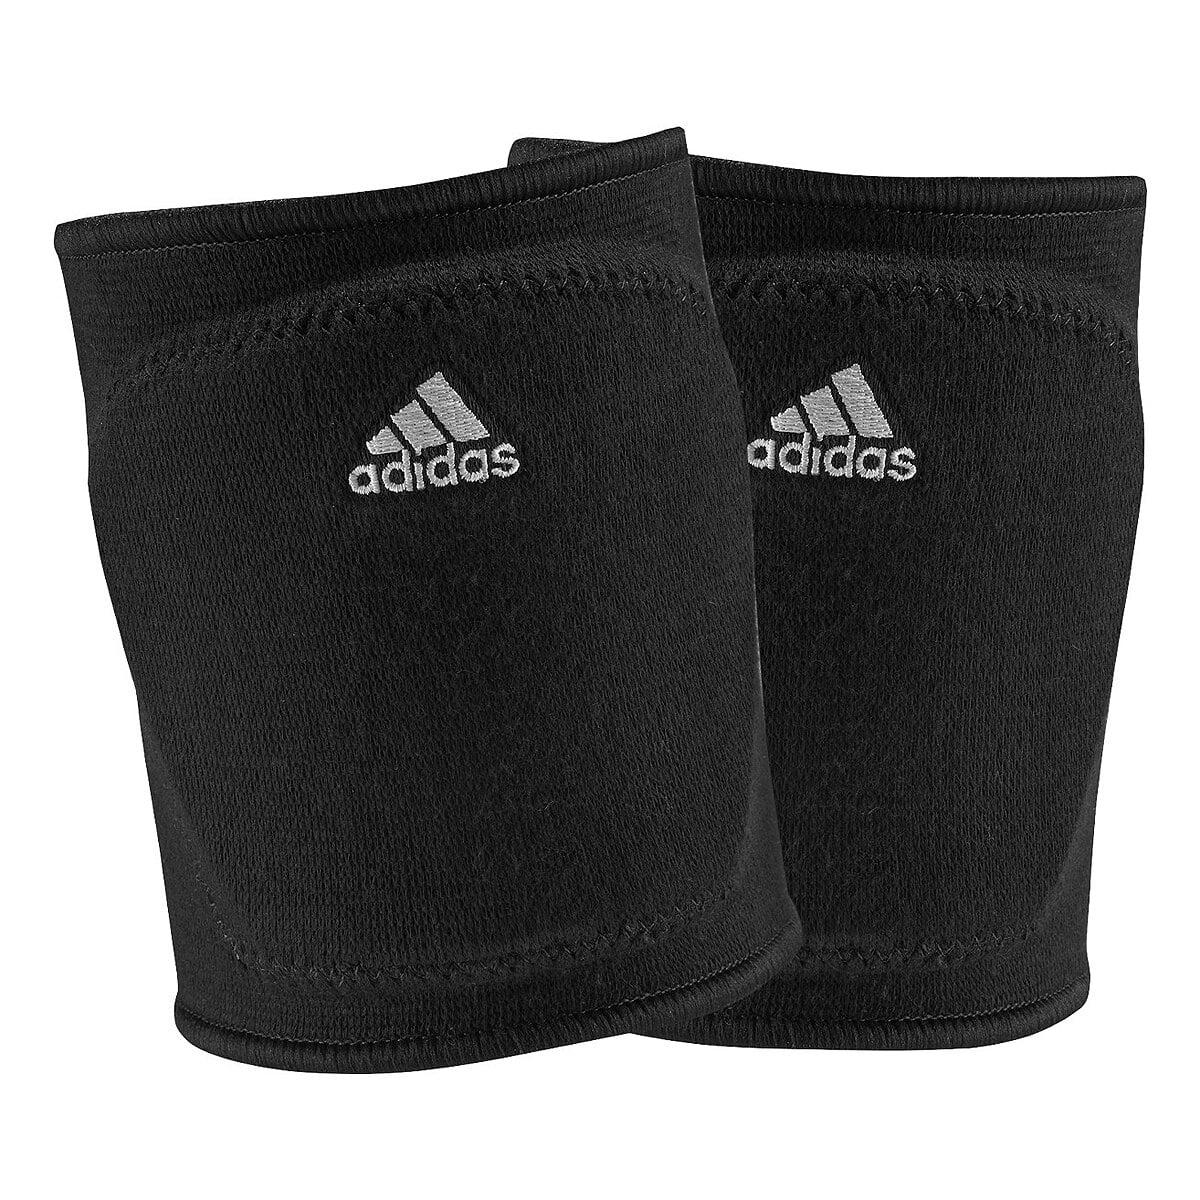 Adidas 5 Quot Kp Volleyball Knee Pads Gl5199 Black Walmart Com Walmart Com